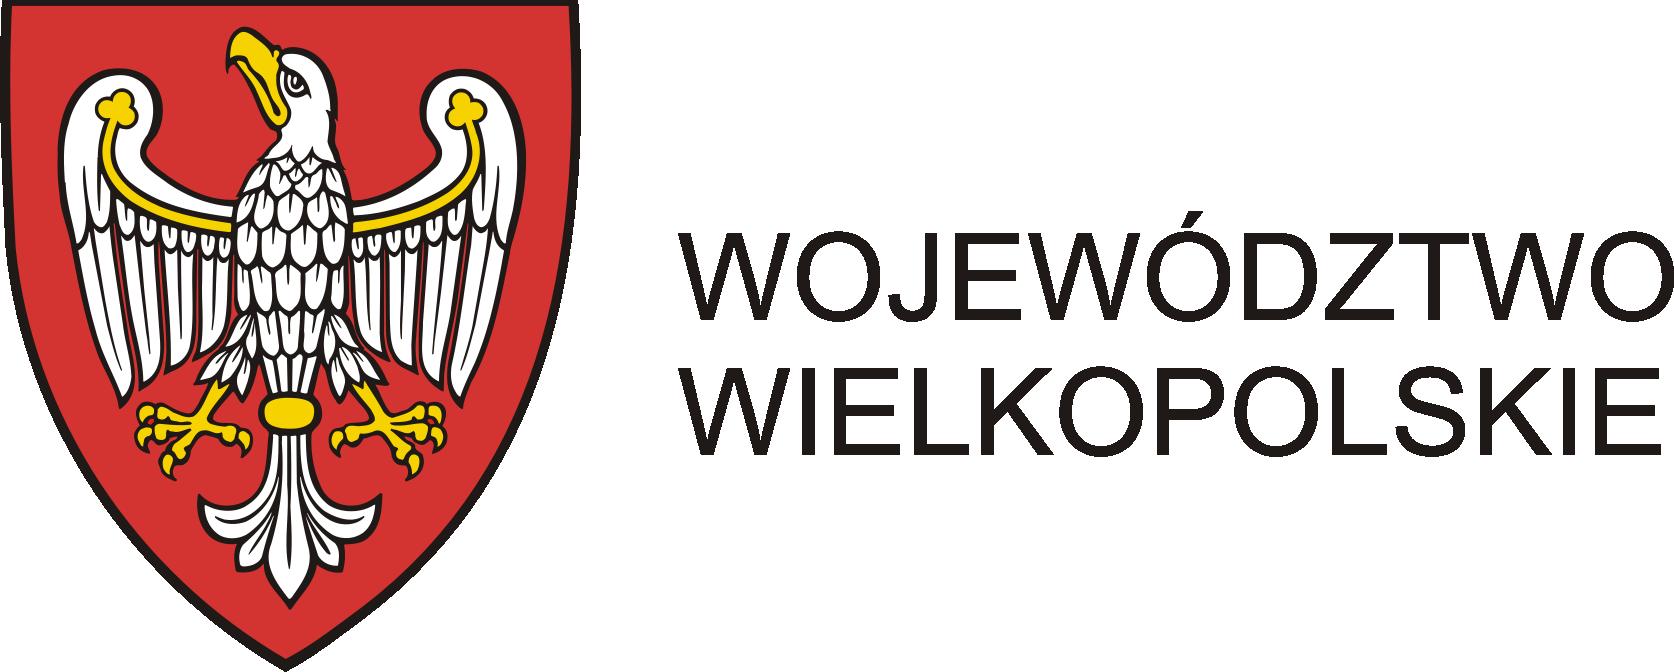 Marshal's Office of Wielkopolskie Voivodeship